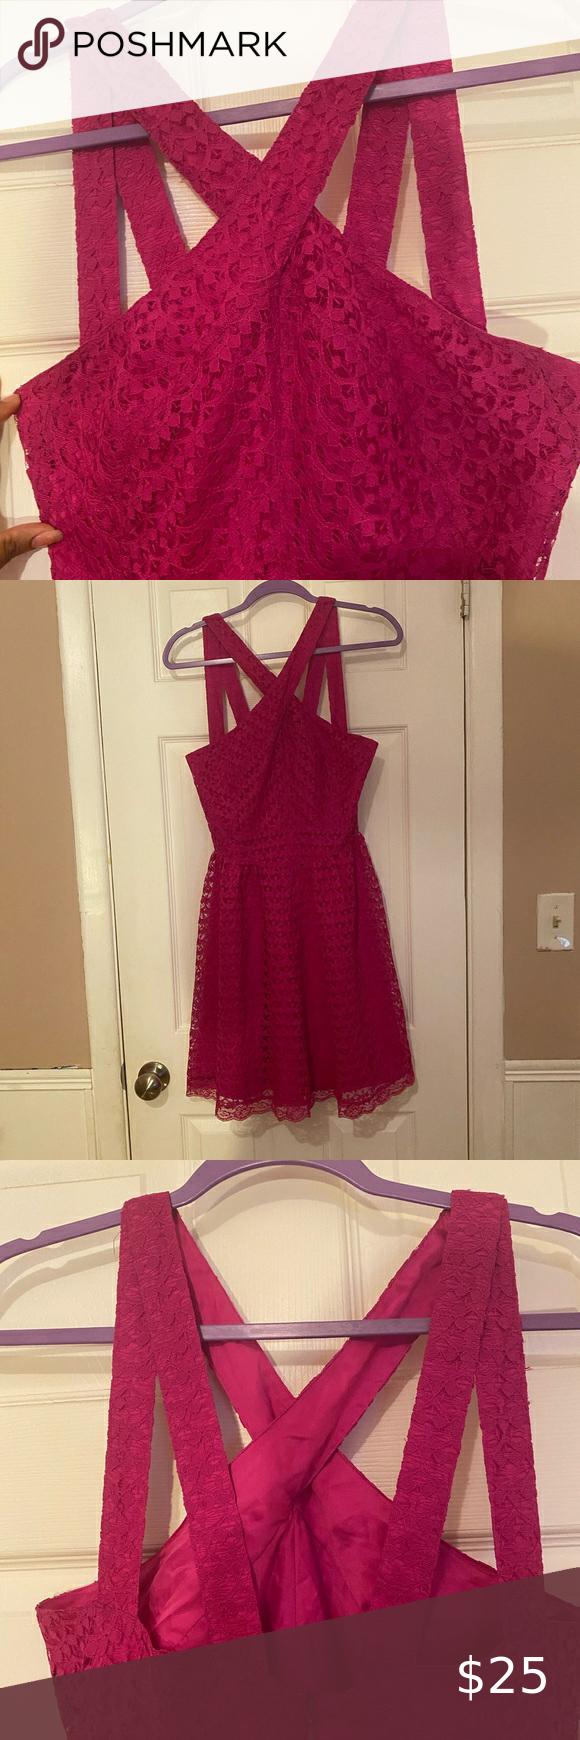 Victoria Secret Pink Dress Lace Pink Dress Pink Dress Victoria Secret Pink [ 1740 x 580 Pixel ]